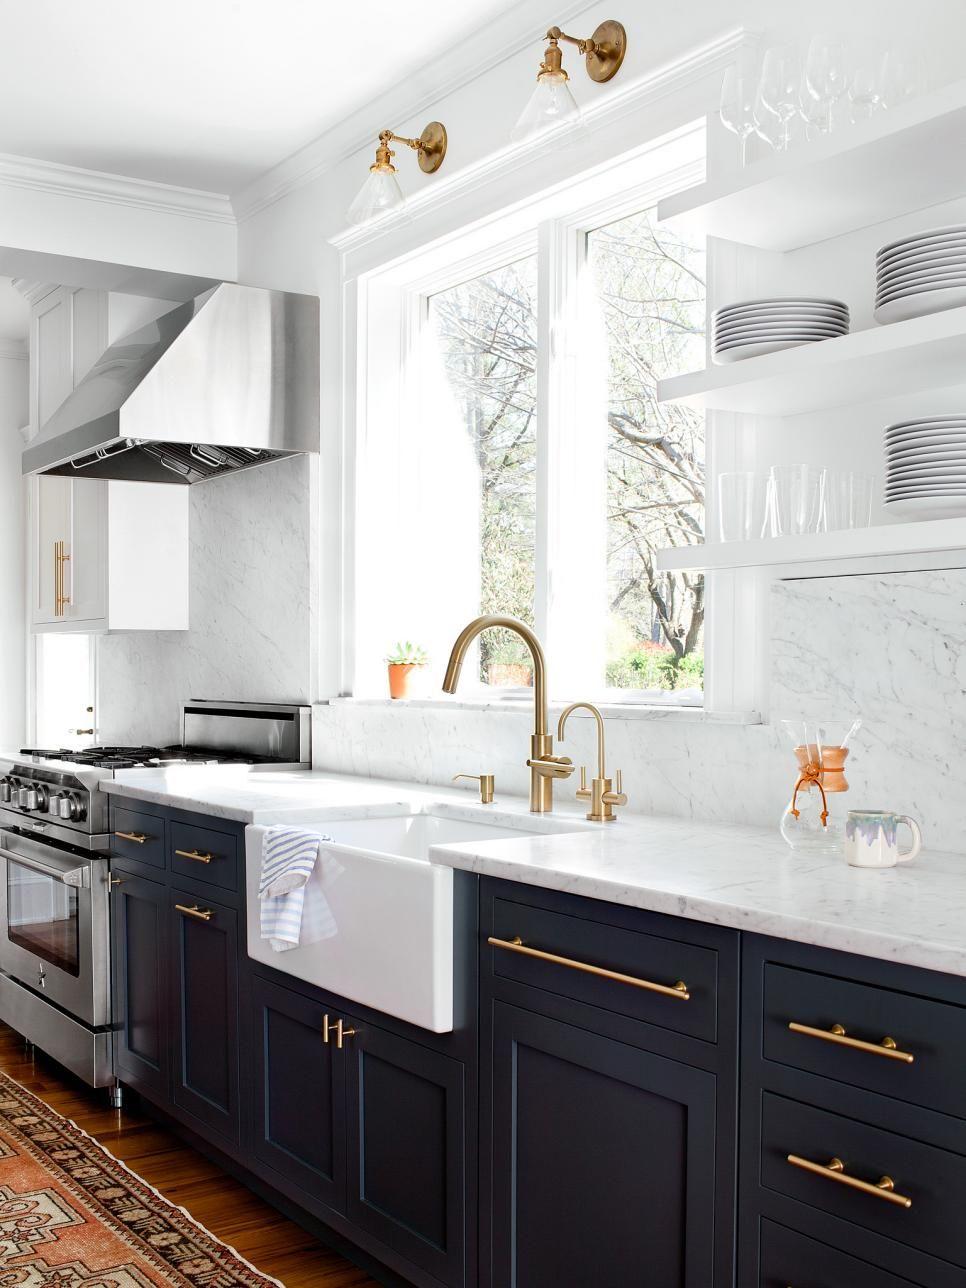 30 Budget Kitchen Updates That Make a Big Impact | Hgtv, Kitchens ...